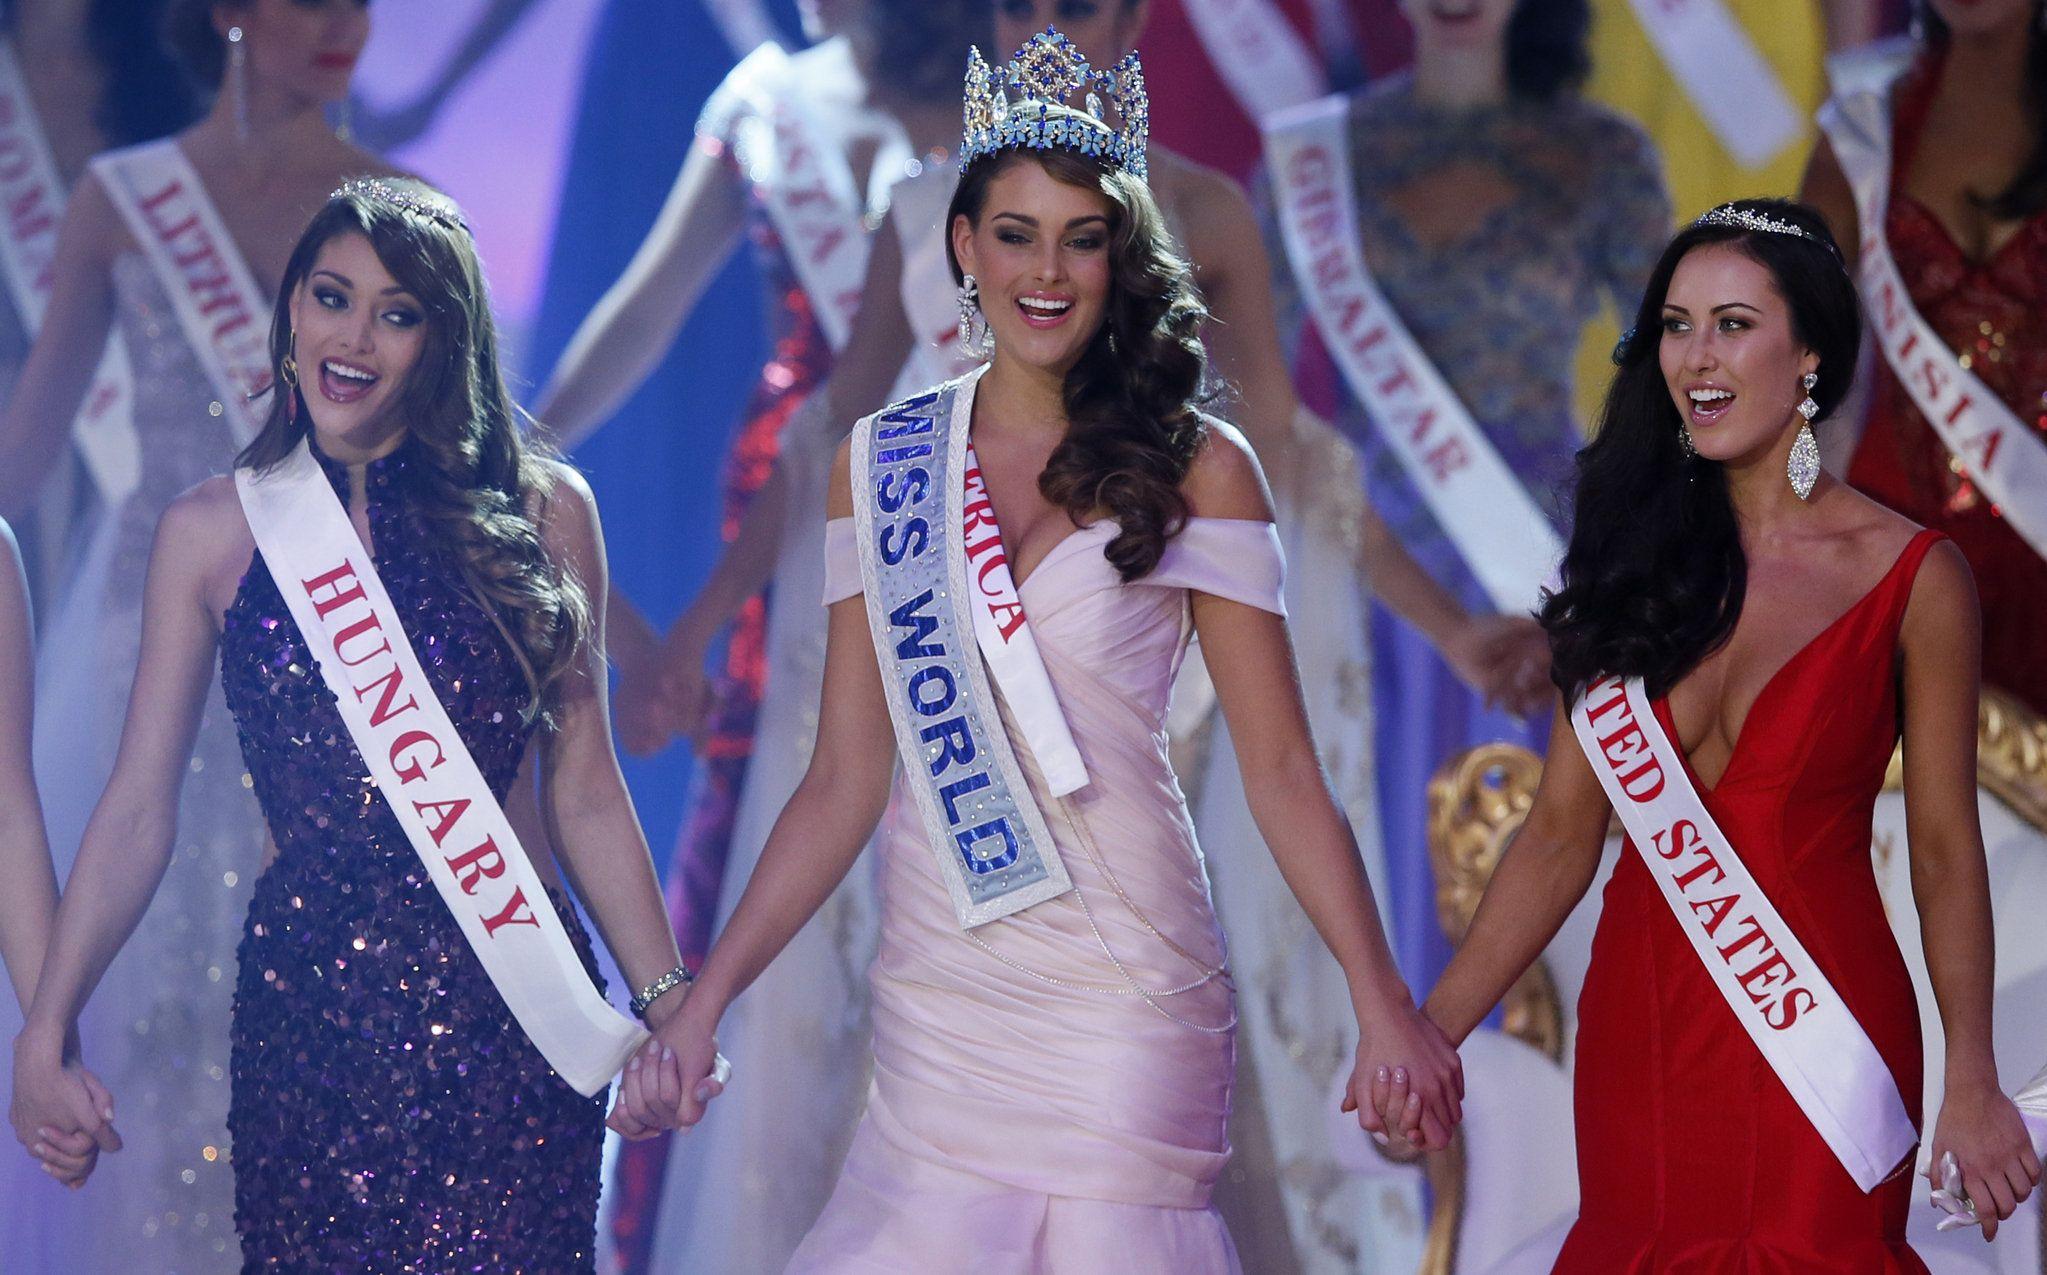 South Africas Rolene Strauss named Miss World 2014 - CBS News